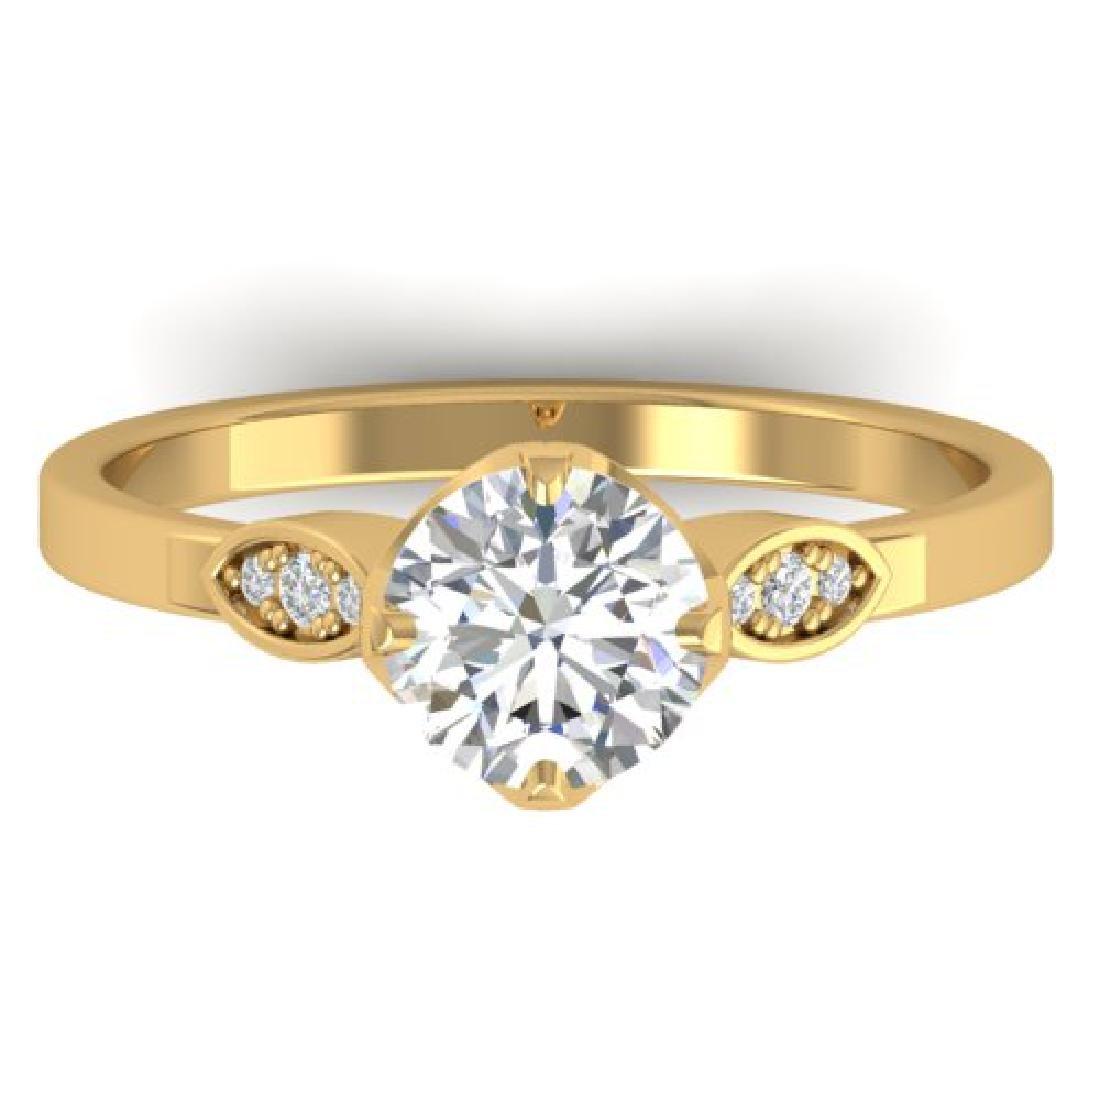 1.05 CTW Certified VS/SI Diamond Solitaire Art Deco